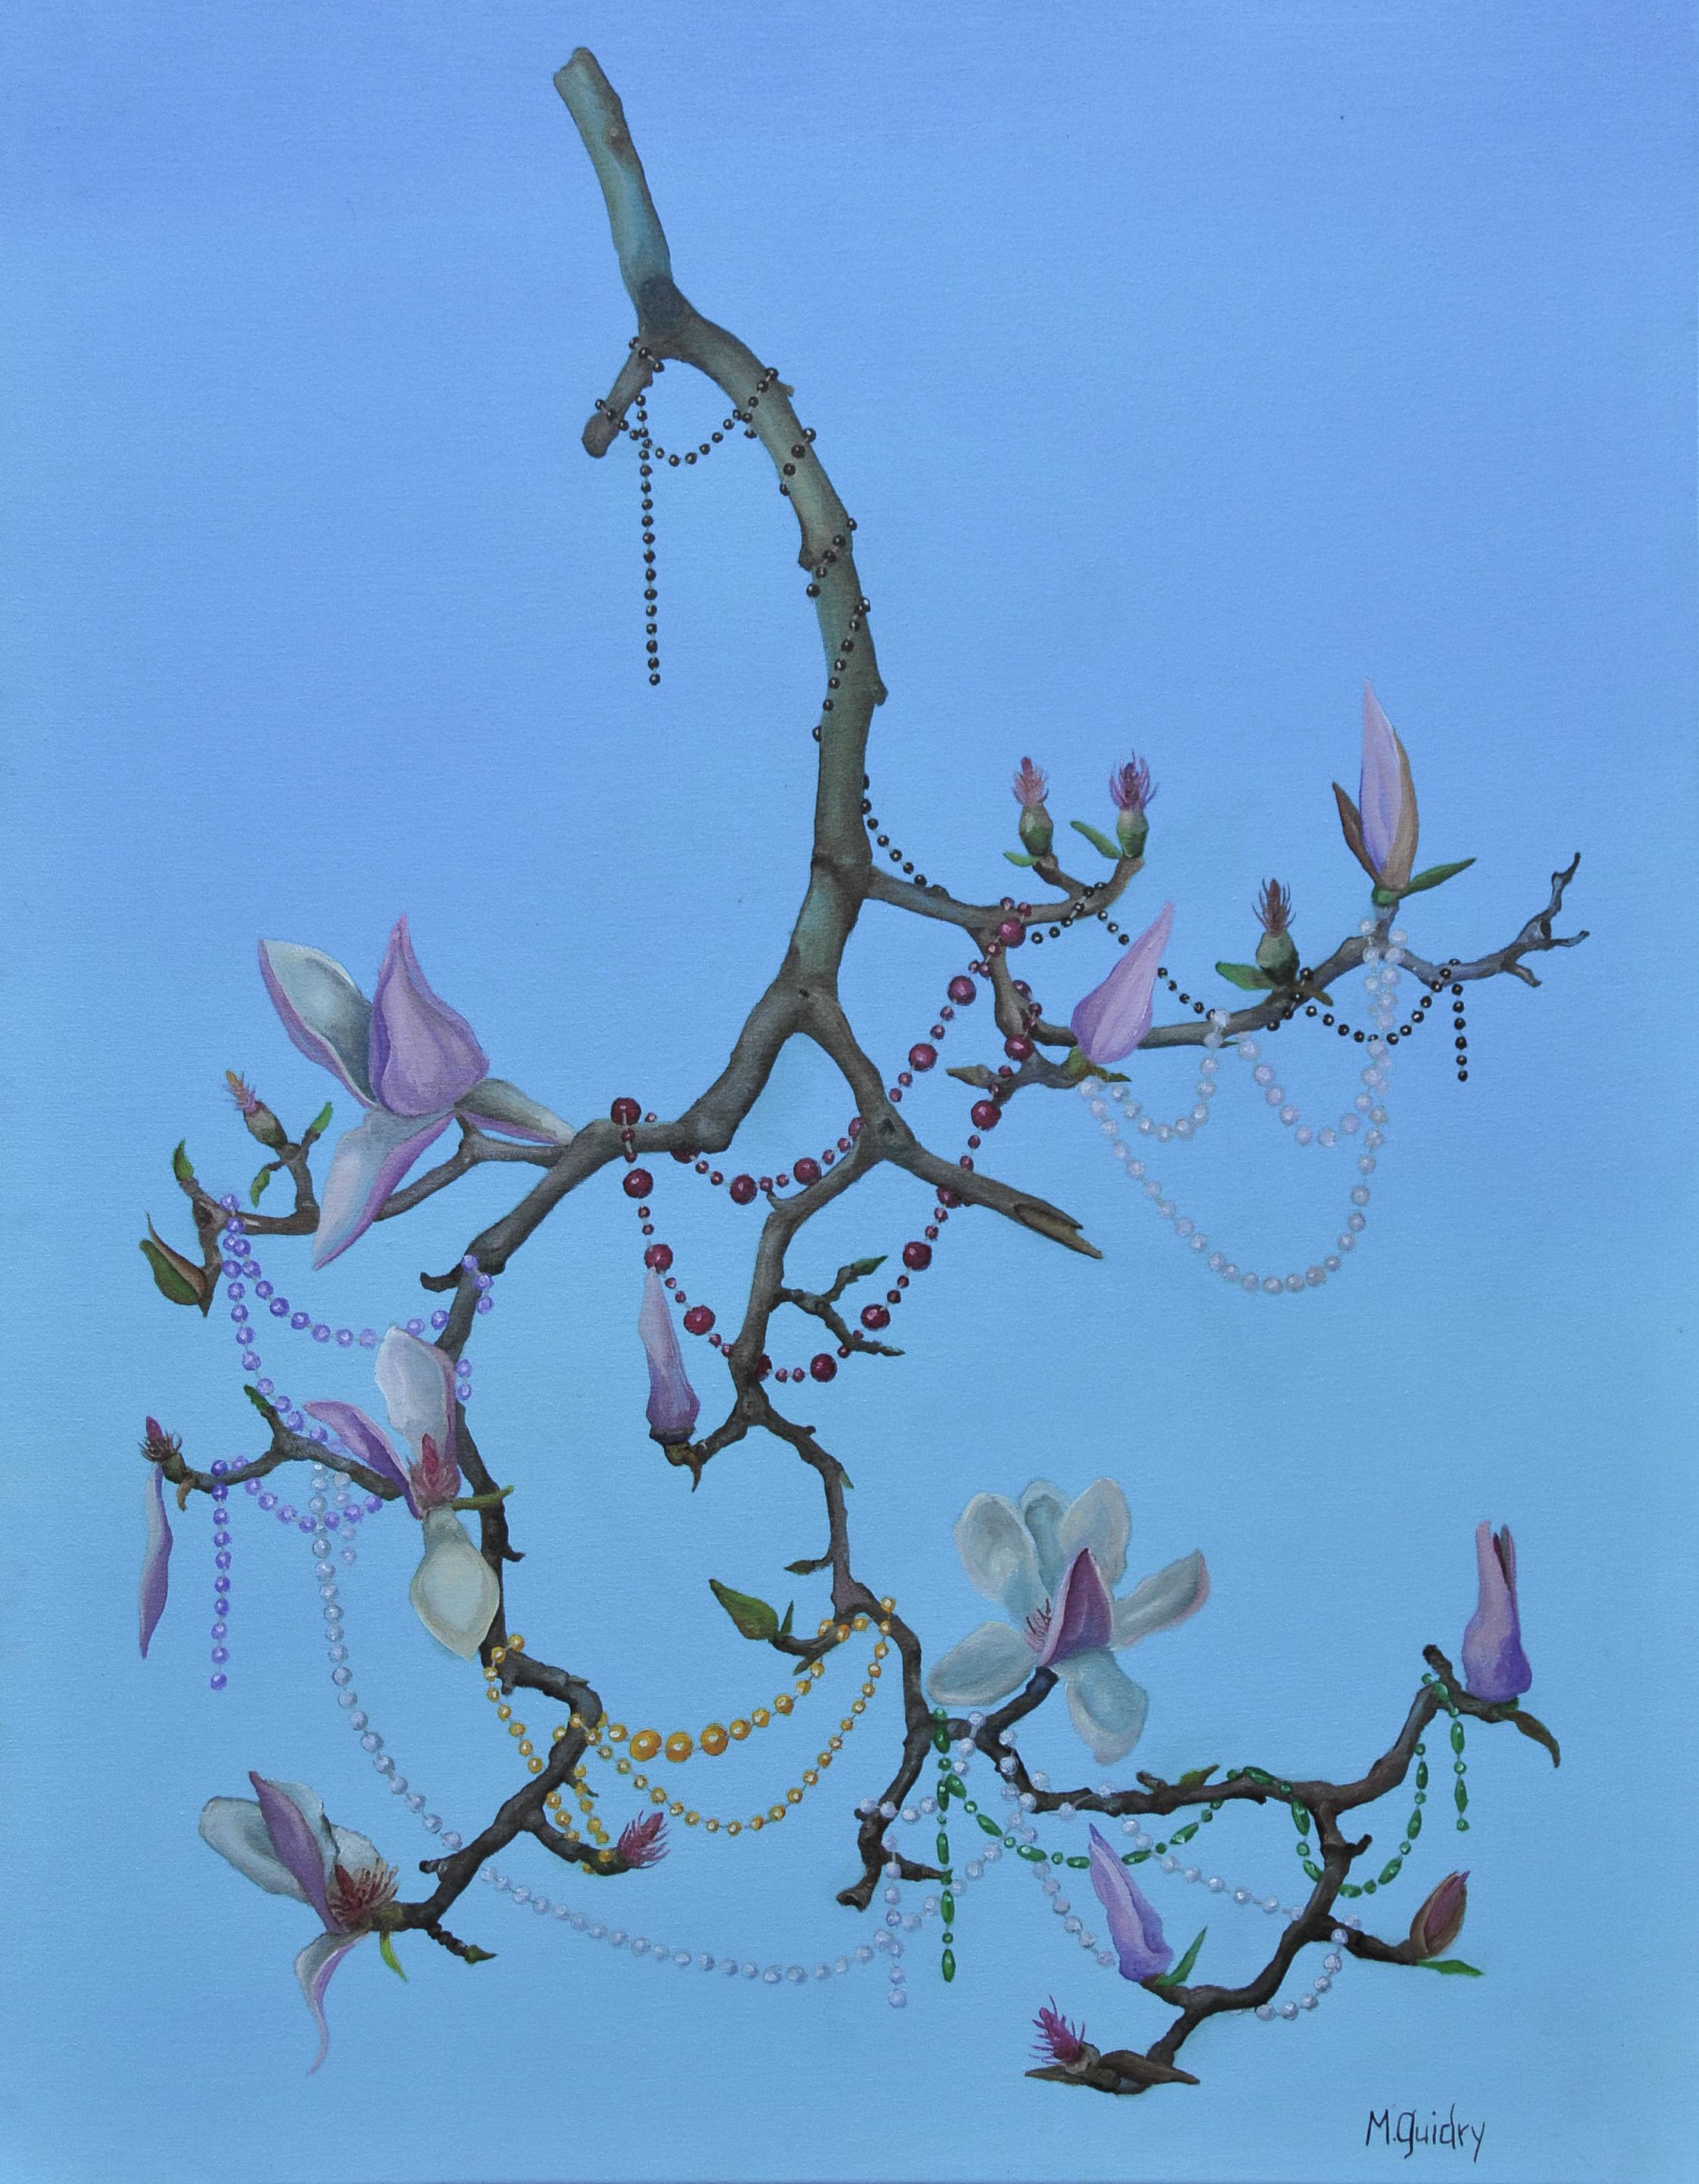 beaded_magnolia_mardi_gras_japanese_tulip_louisiana_m.guidry_michael_guidry_oil_painting_marsh_new_orleans_artist.jpg.jpg